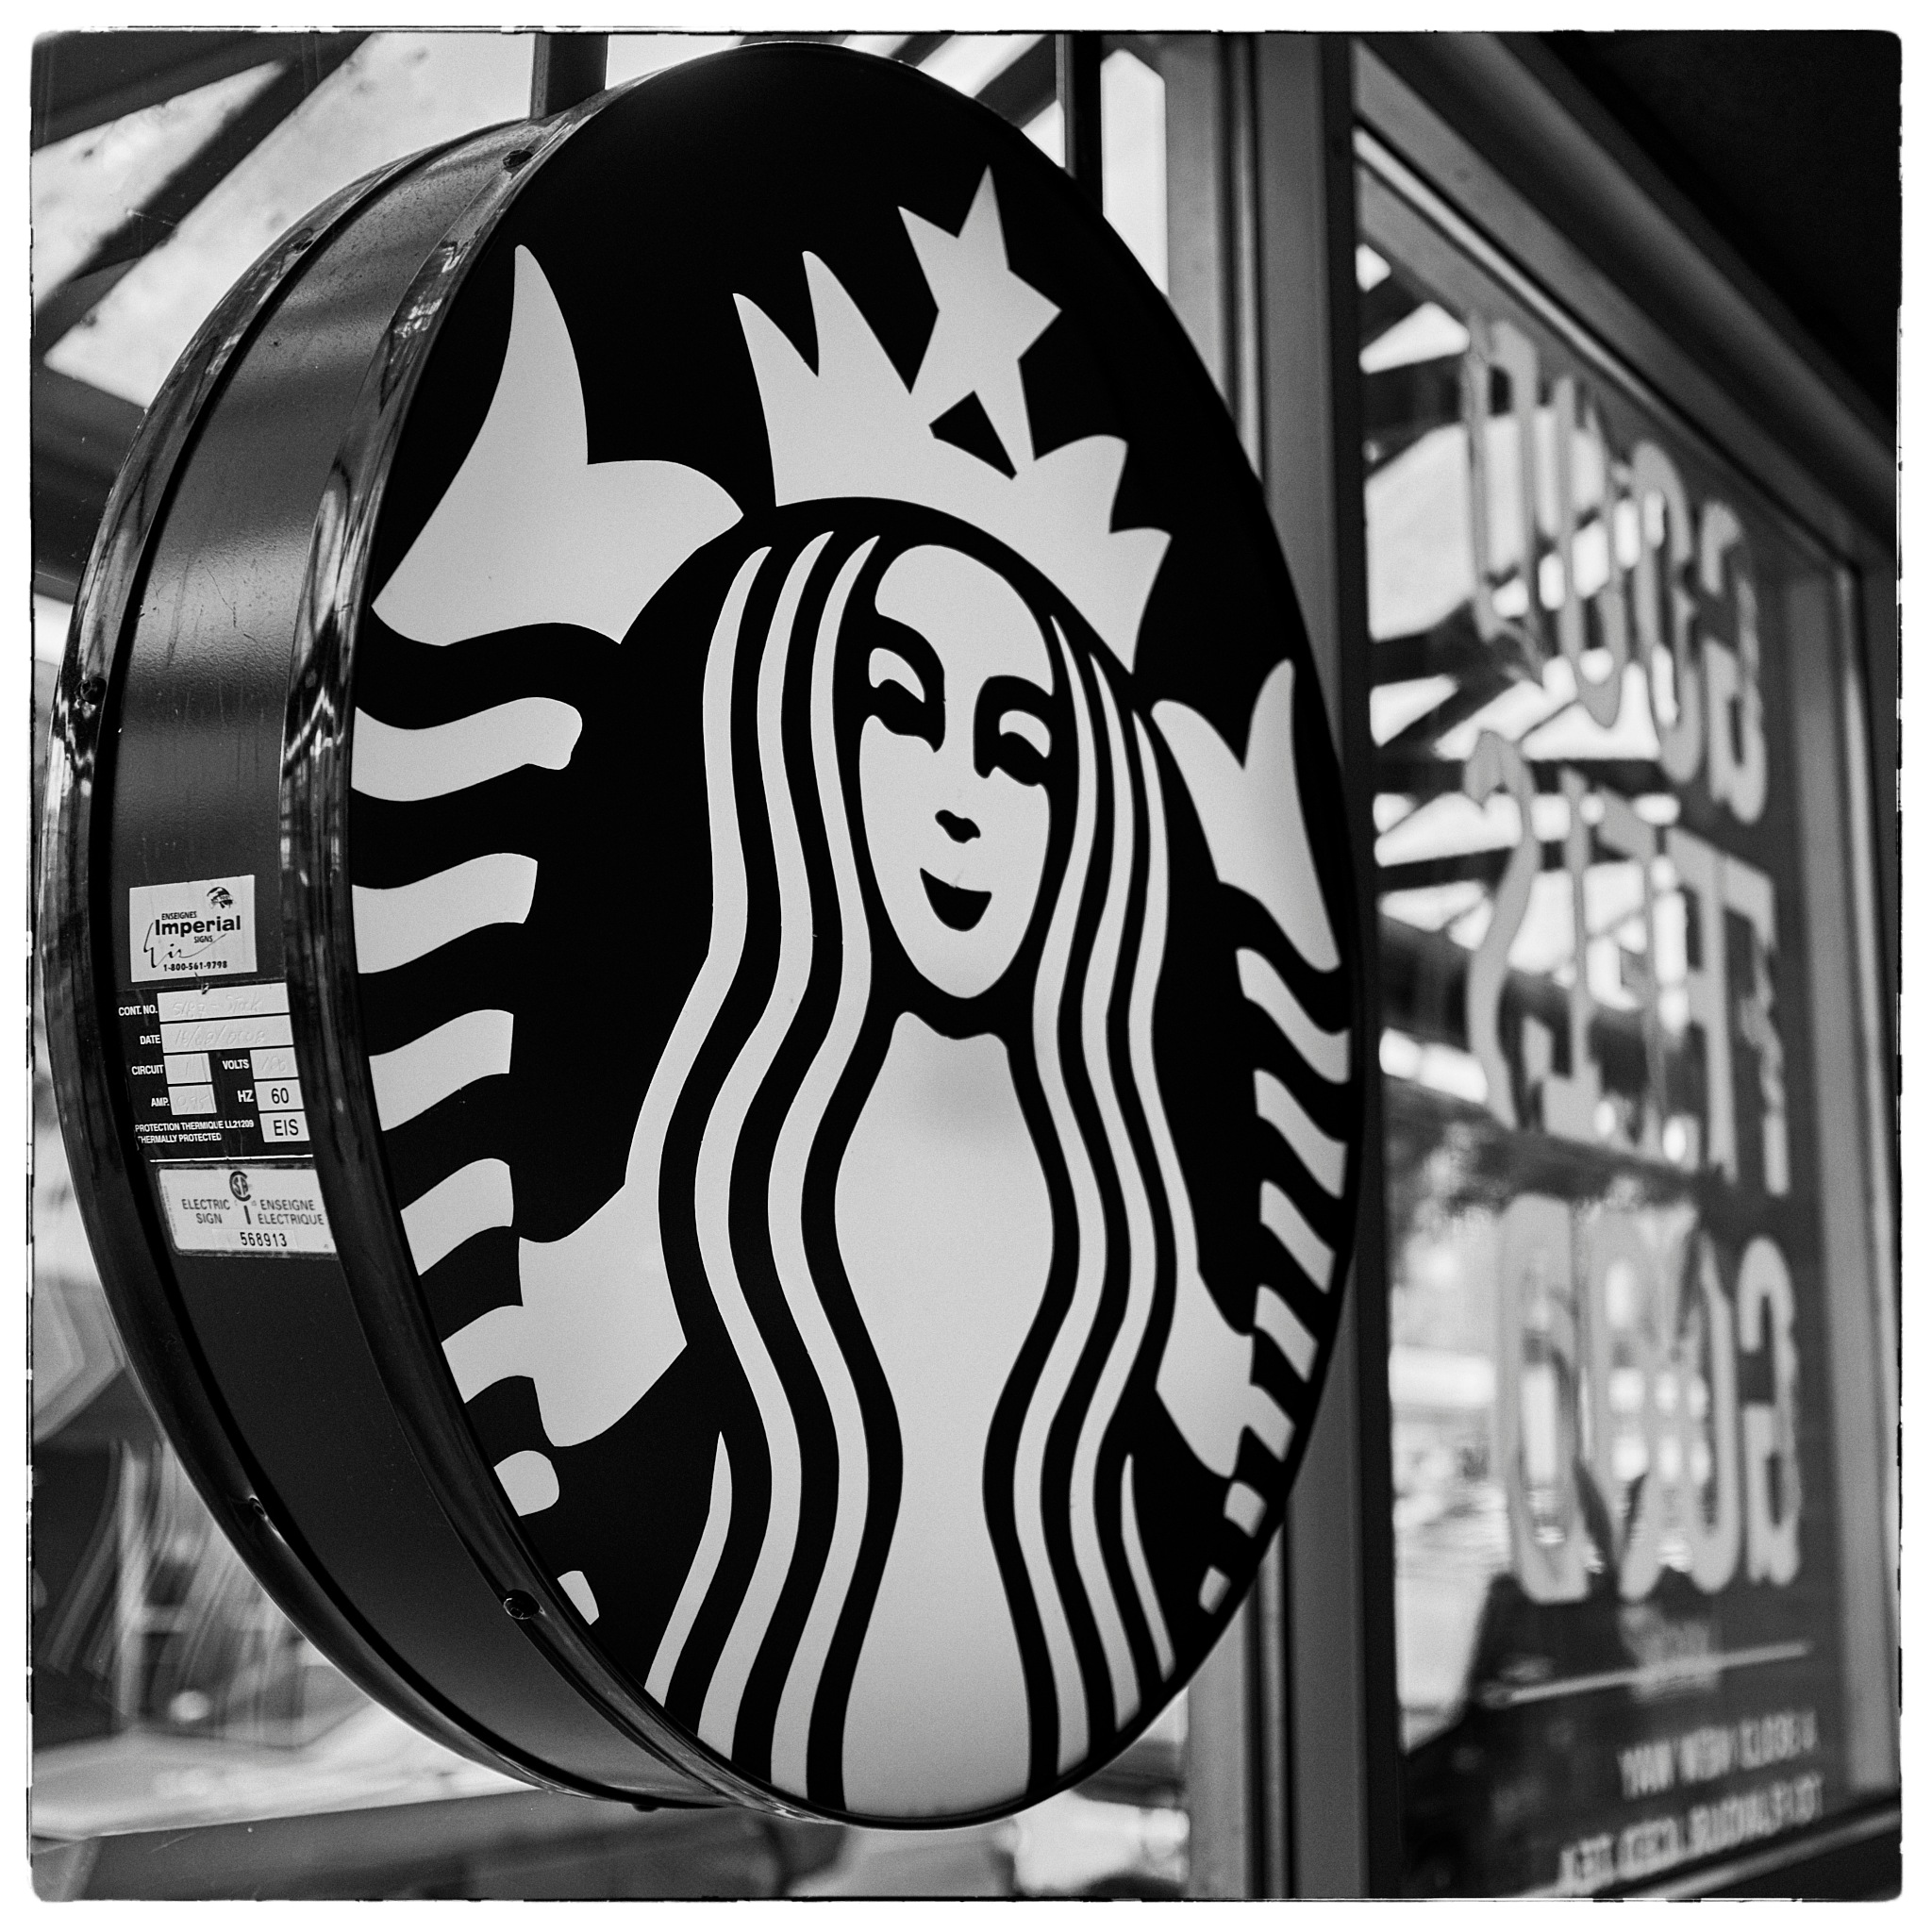 Starbucks by Greg Mullaly